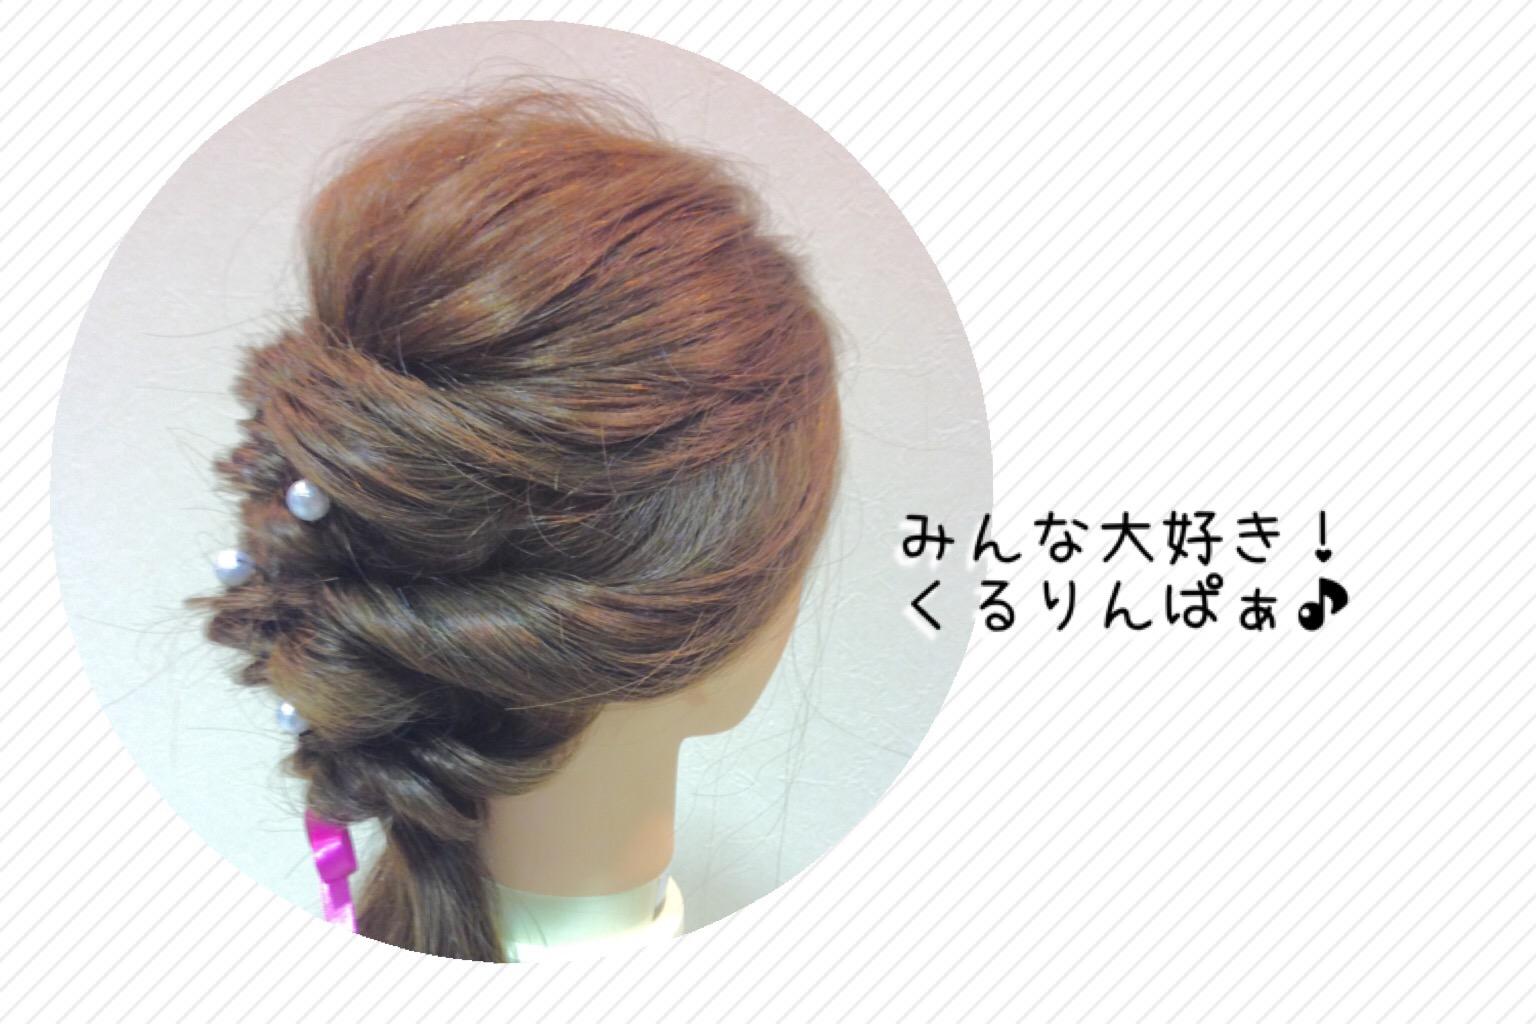 IMG_8322.JPG